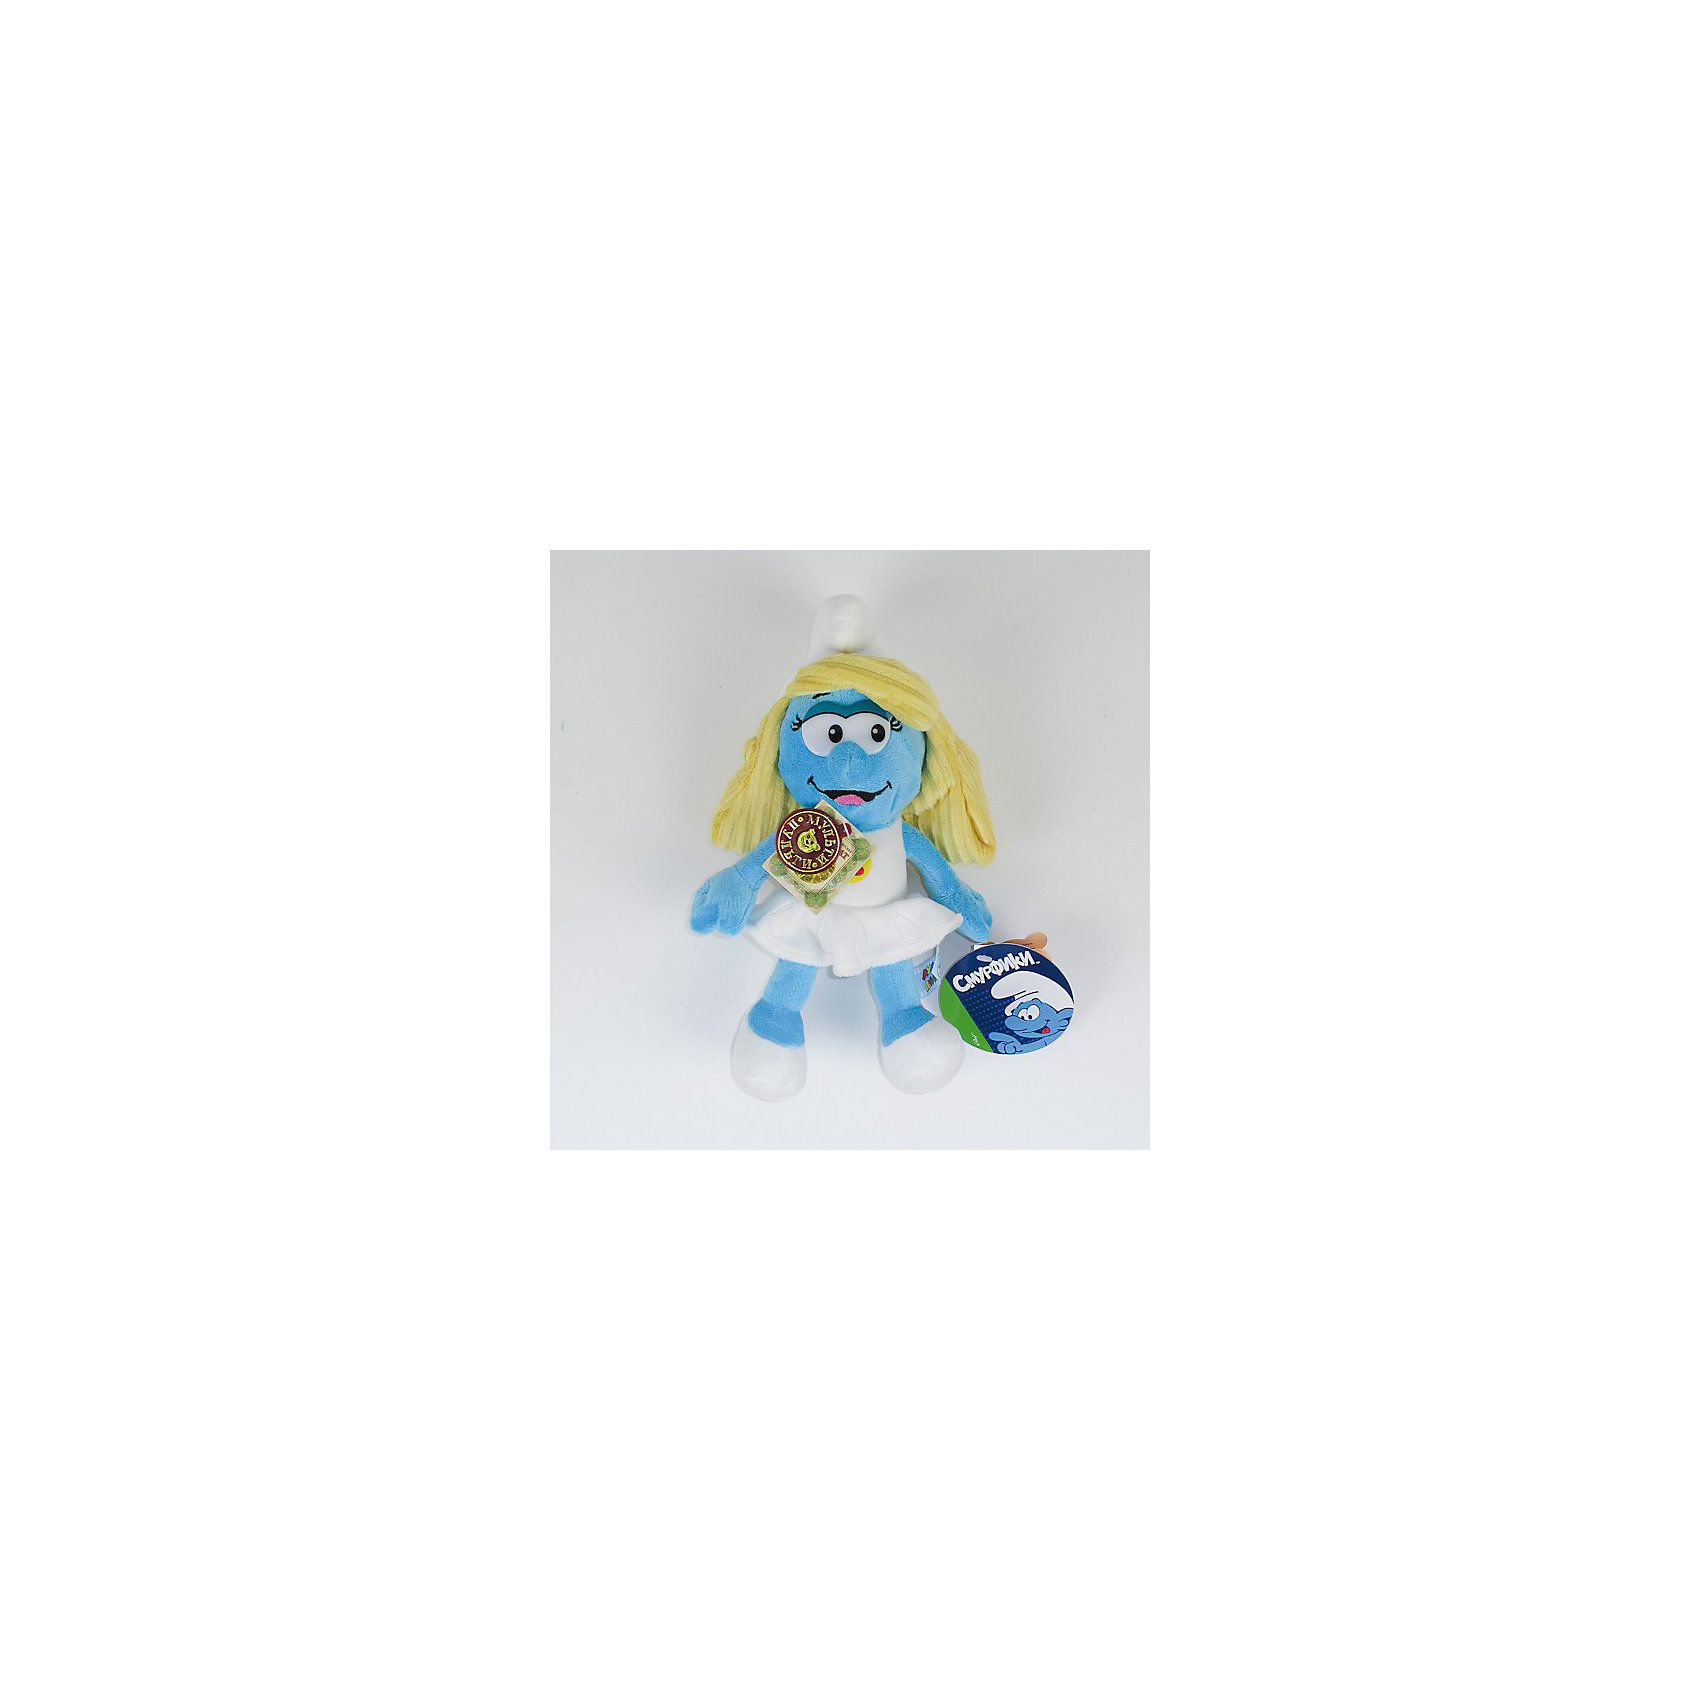 Мягкая игрушка  Смурфетта, 26 см,